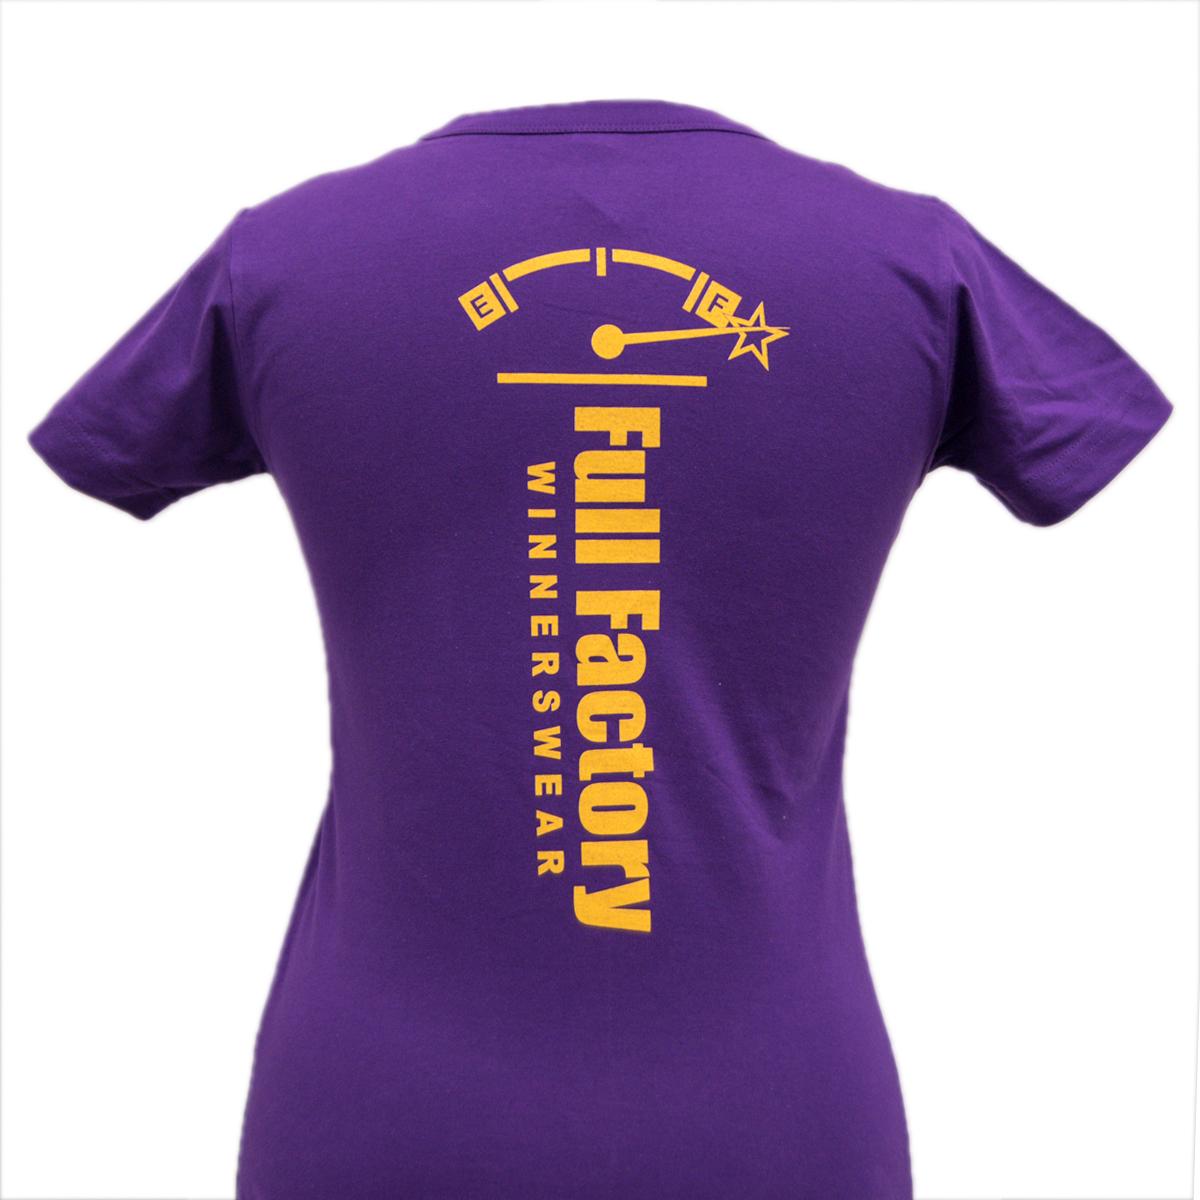 Ladies Full Factory Purple & Yellow T-Shirt Image (Back)